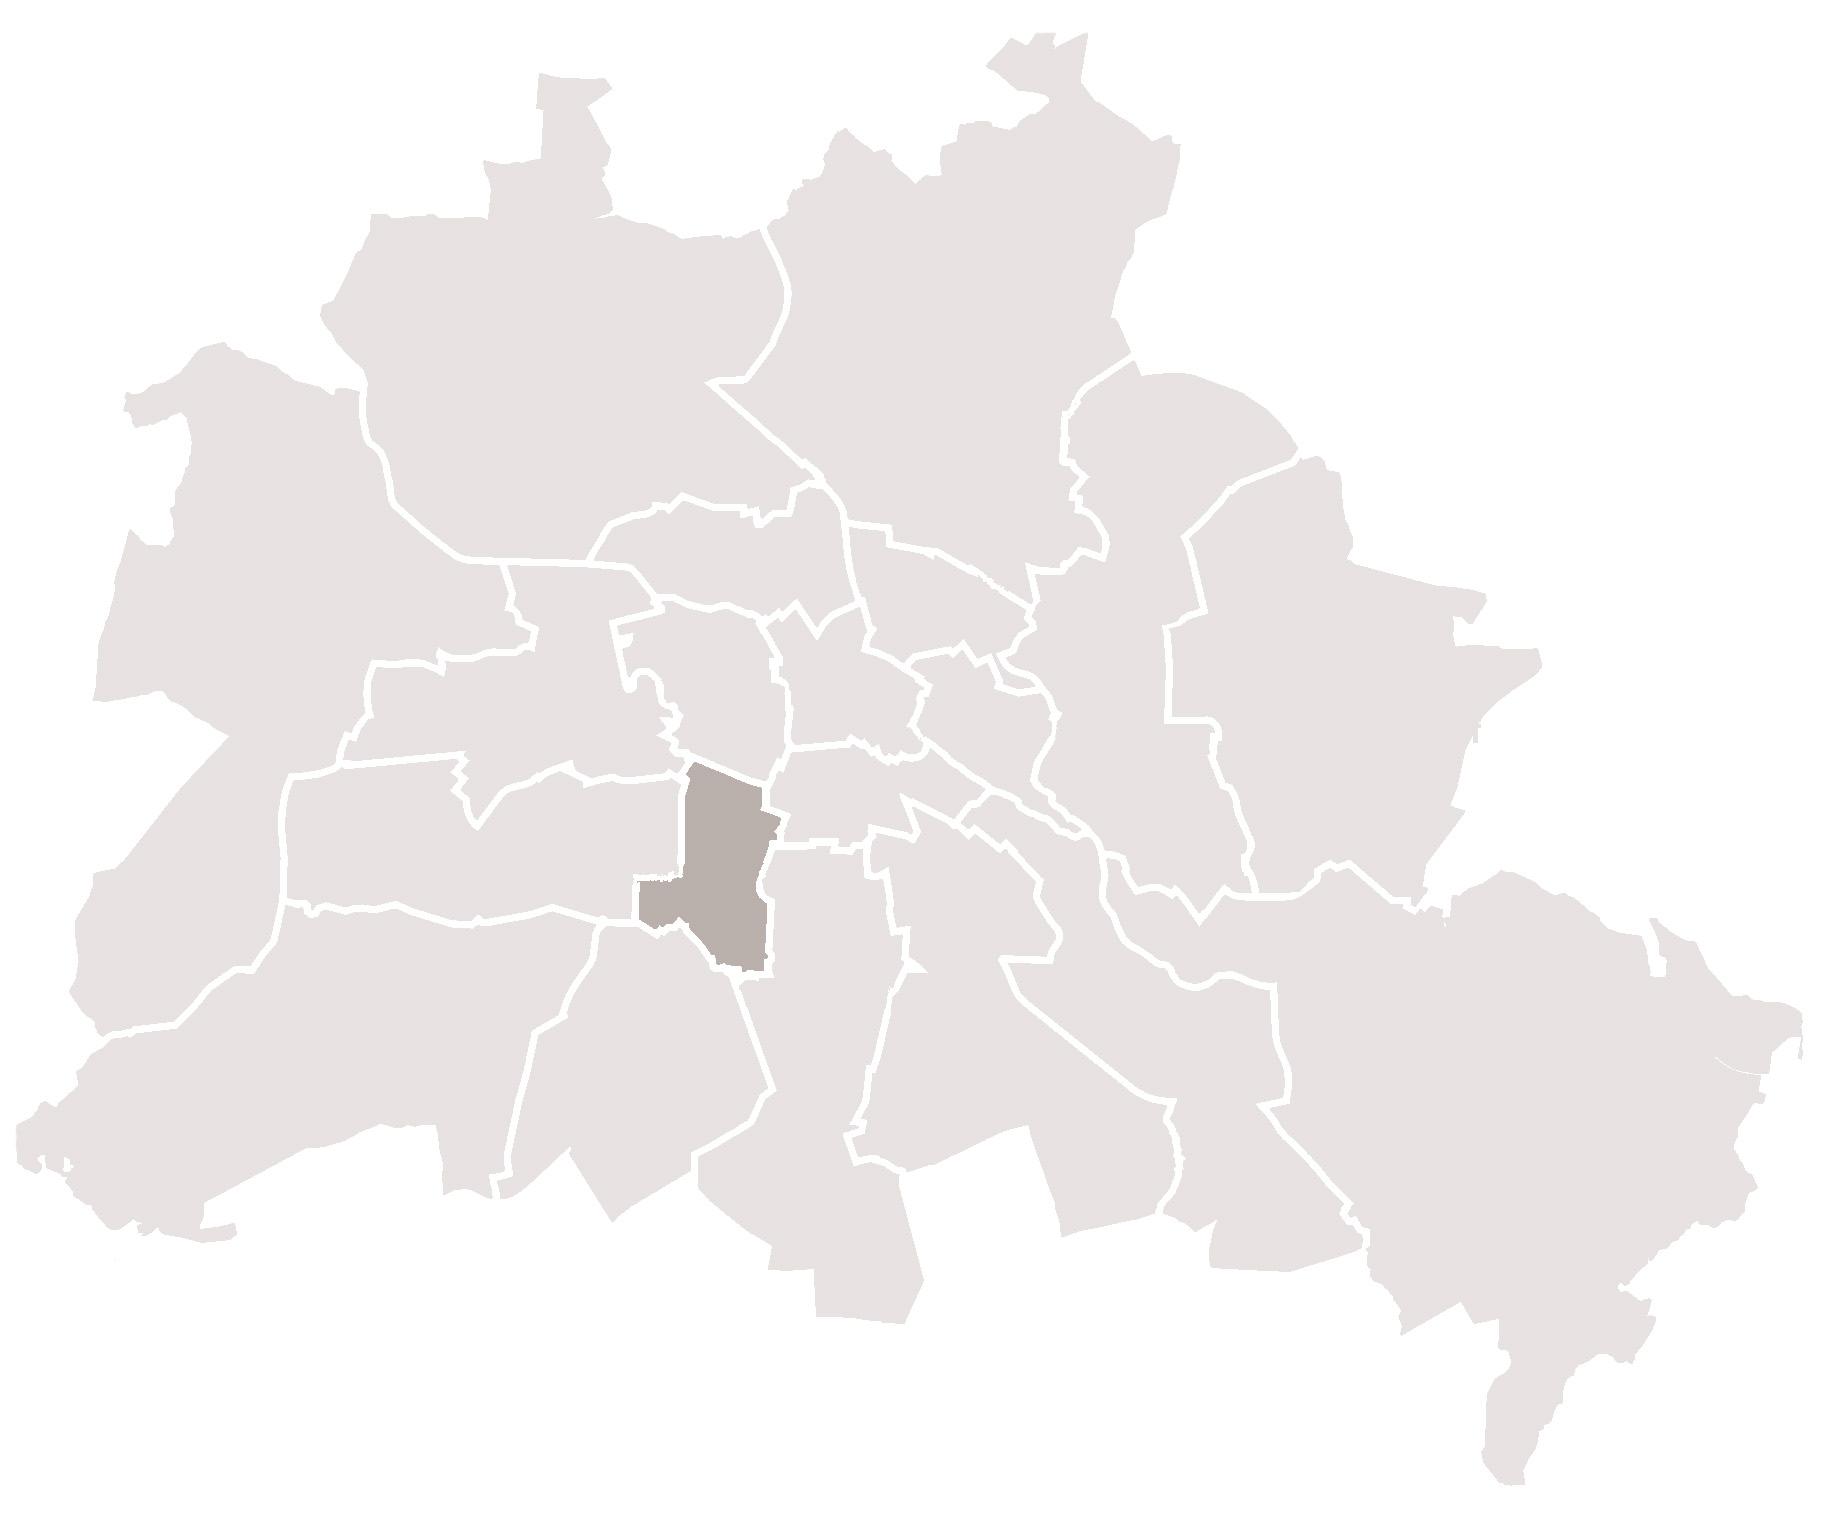 Berlin Schöneberg Karte